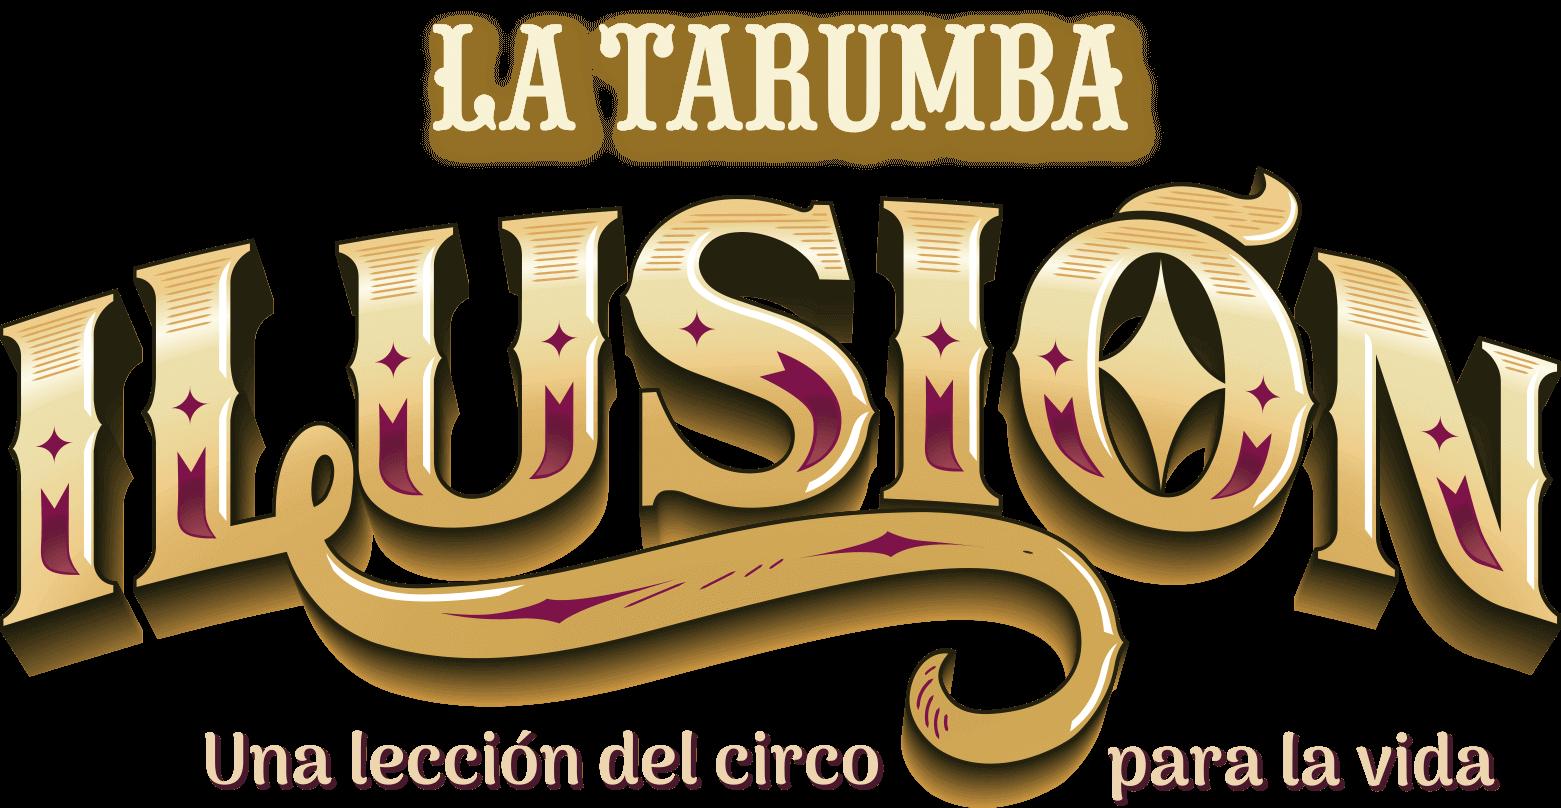 Circo La Tarumba - Entradas Ilusión